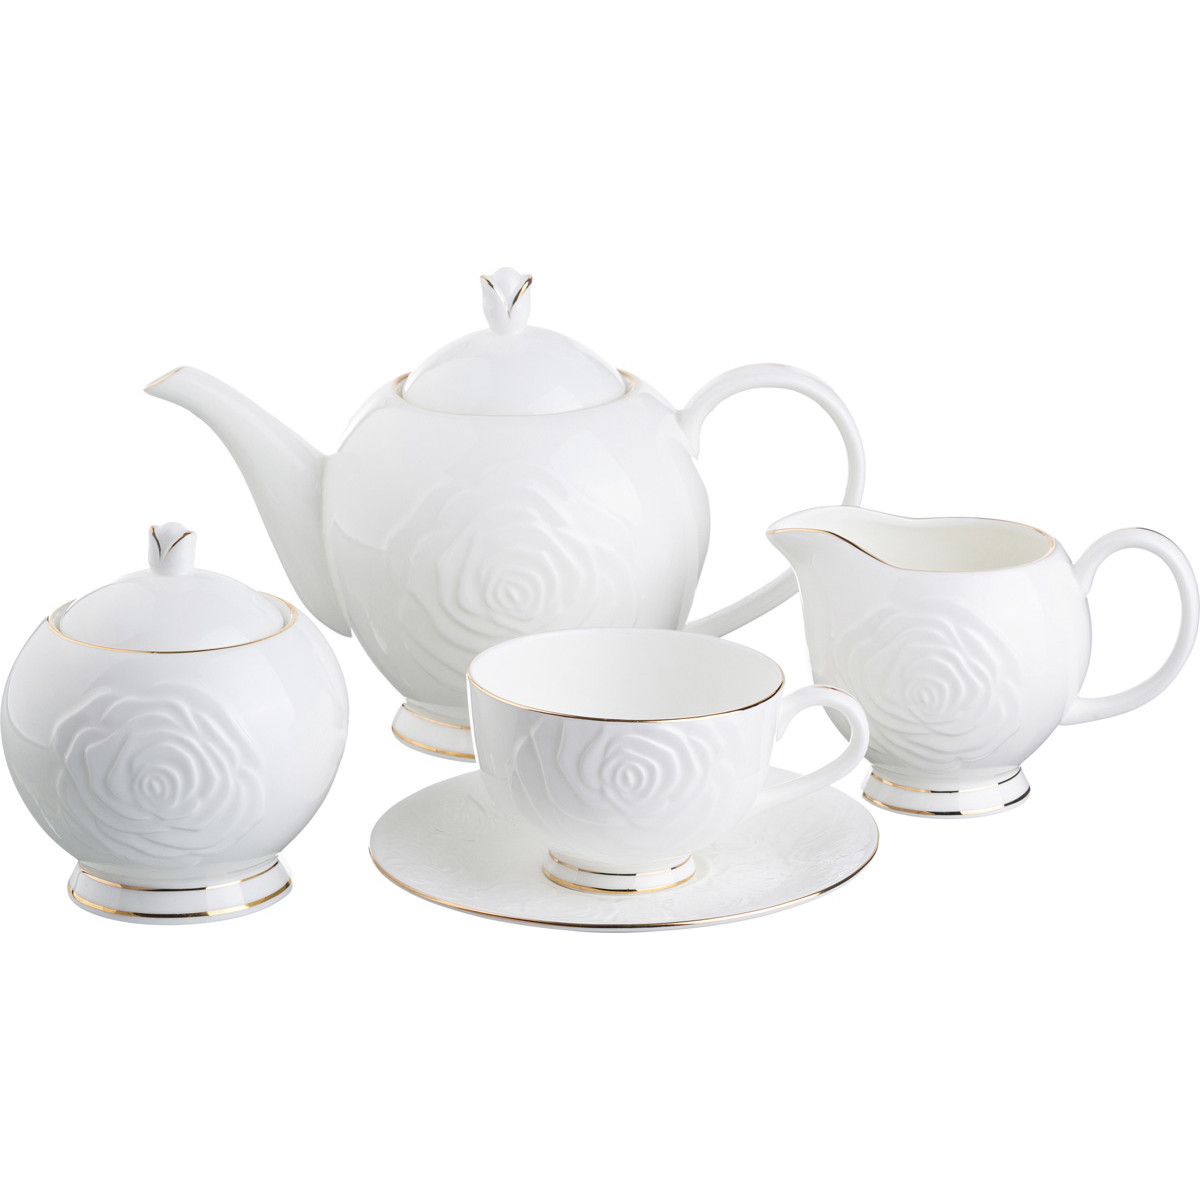 {} Lefard Чайный сервиз Blanco (Набор) чайный сервиз lefard 760 456